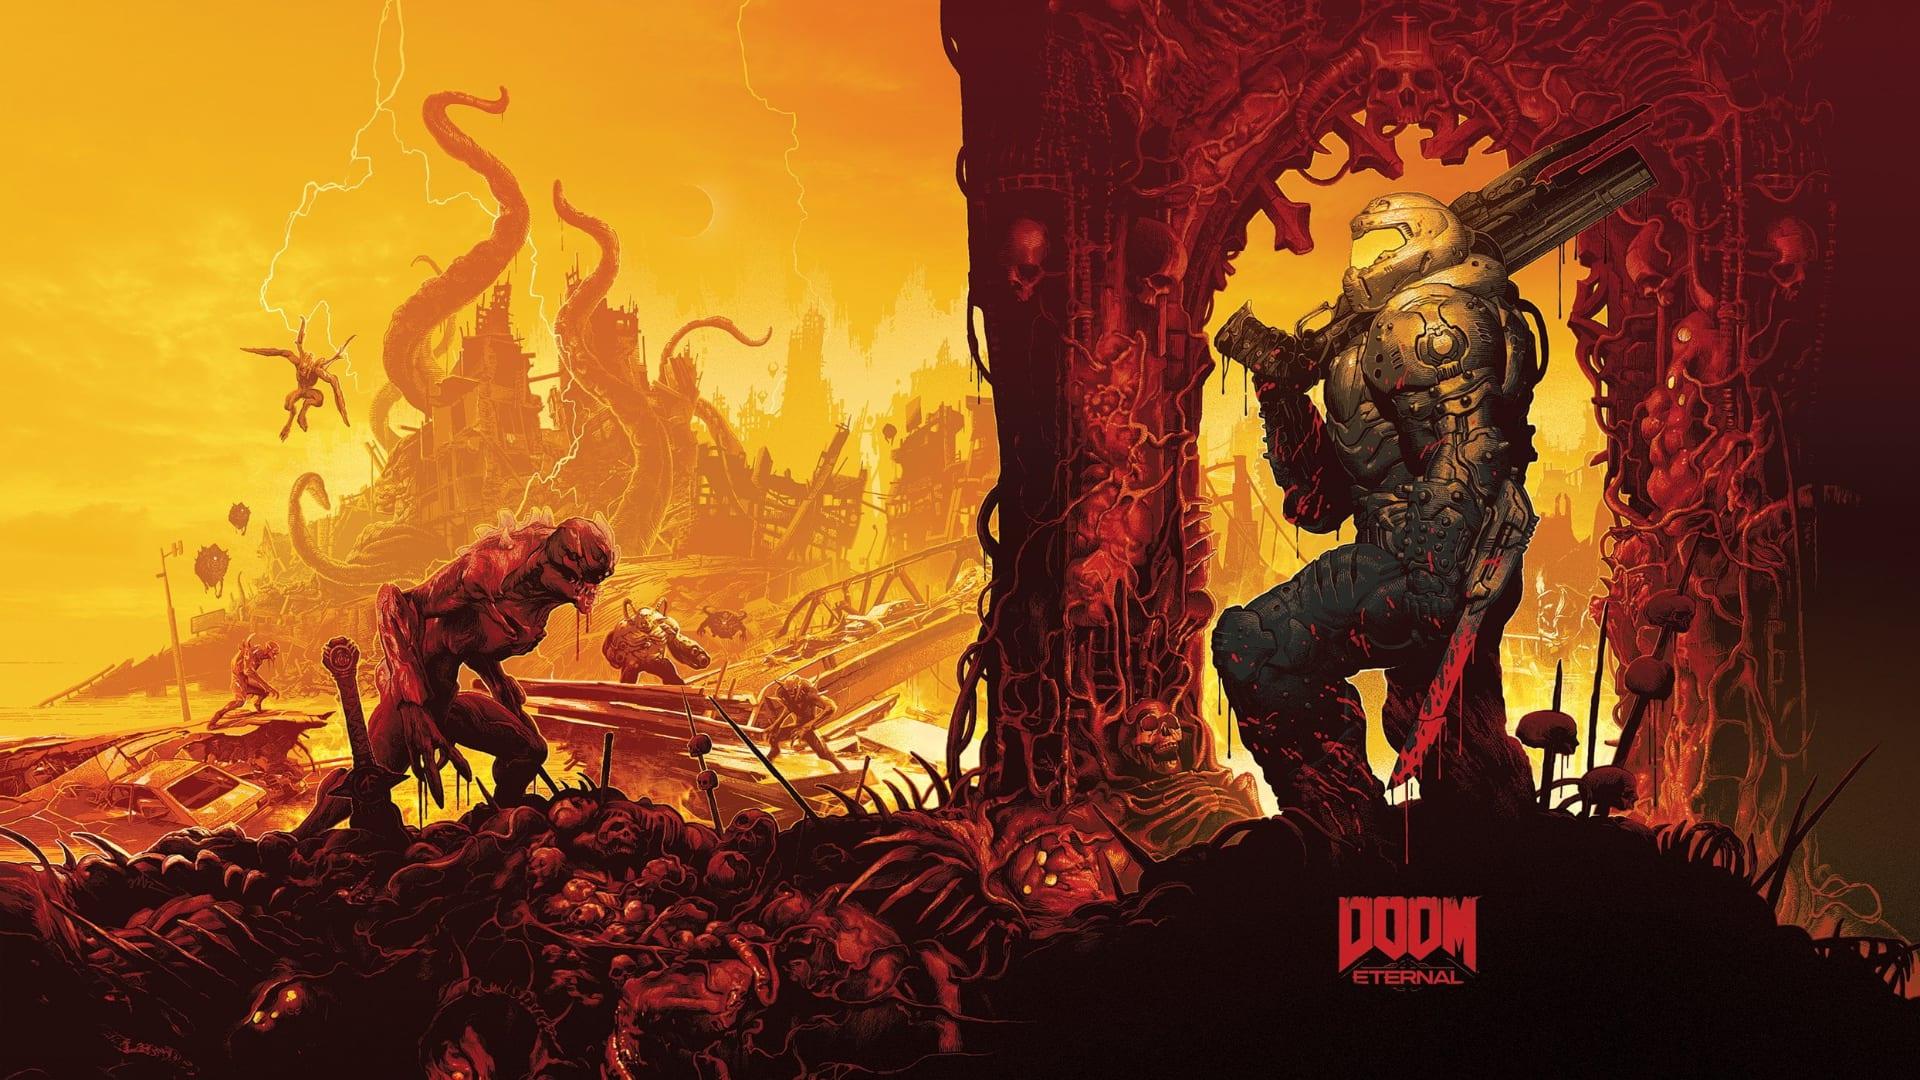 4k Hd Doom Eternal Wallpapers You Need To Make Your Desktop Background